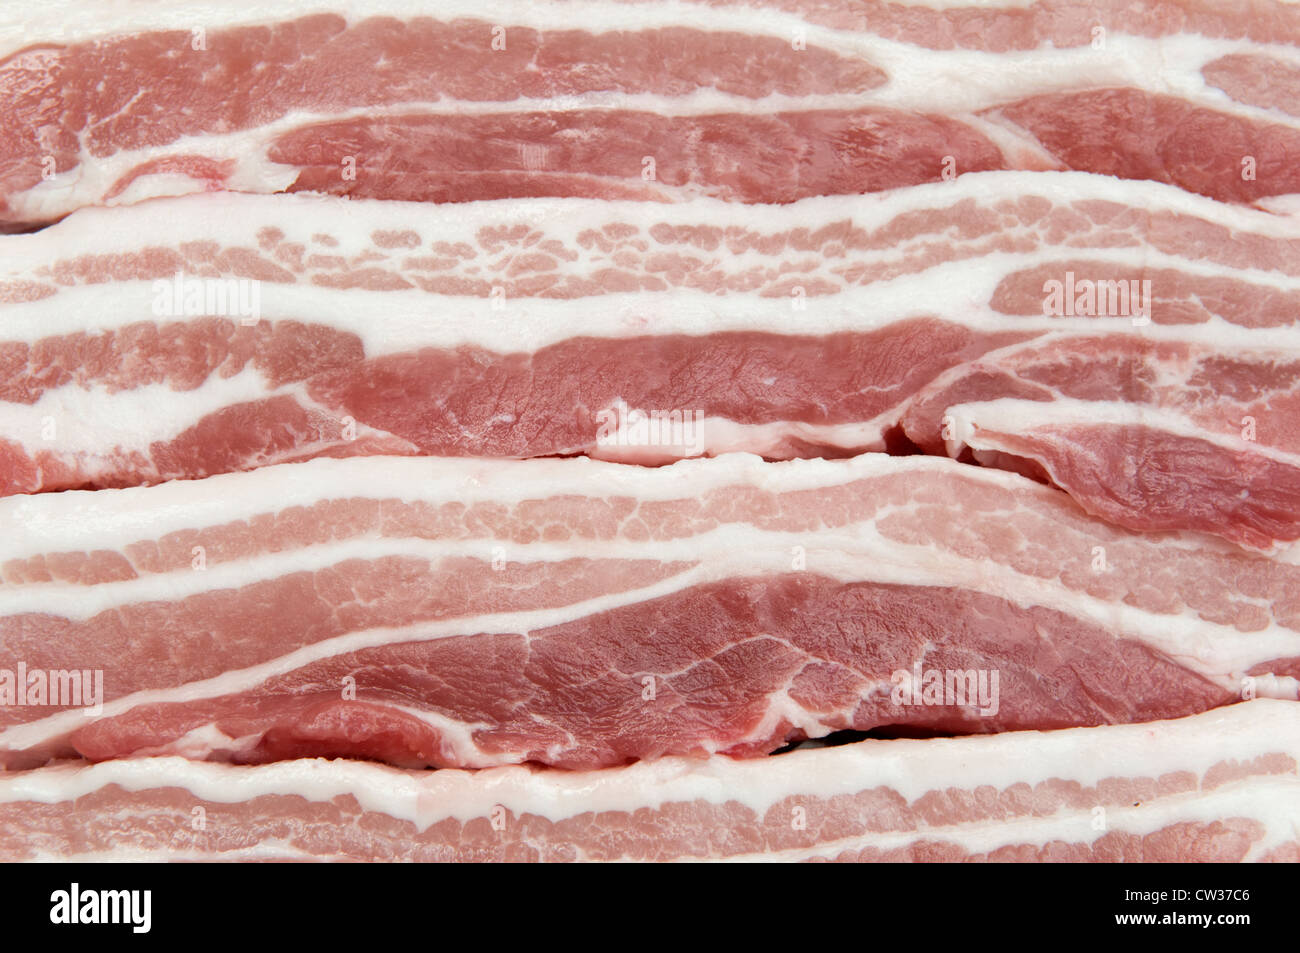 Rindless belly pork slices - Stock Image